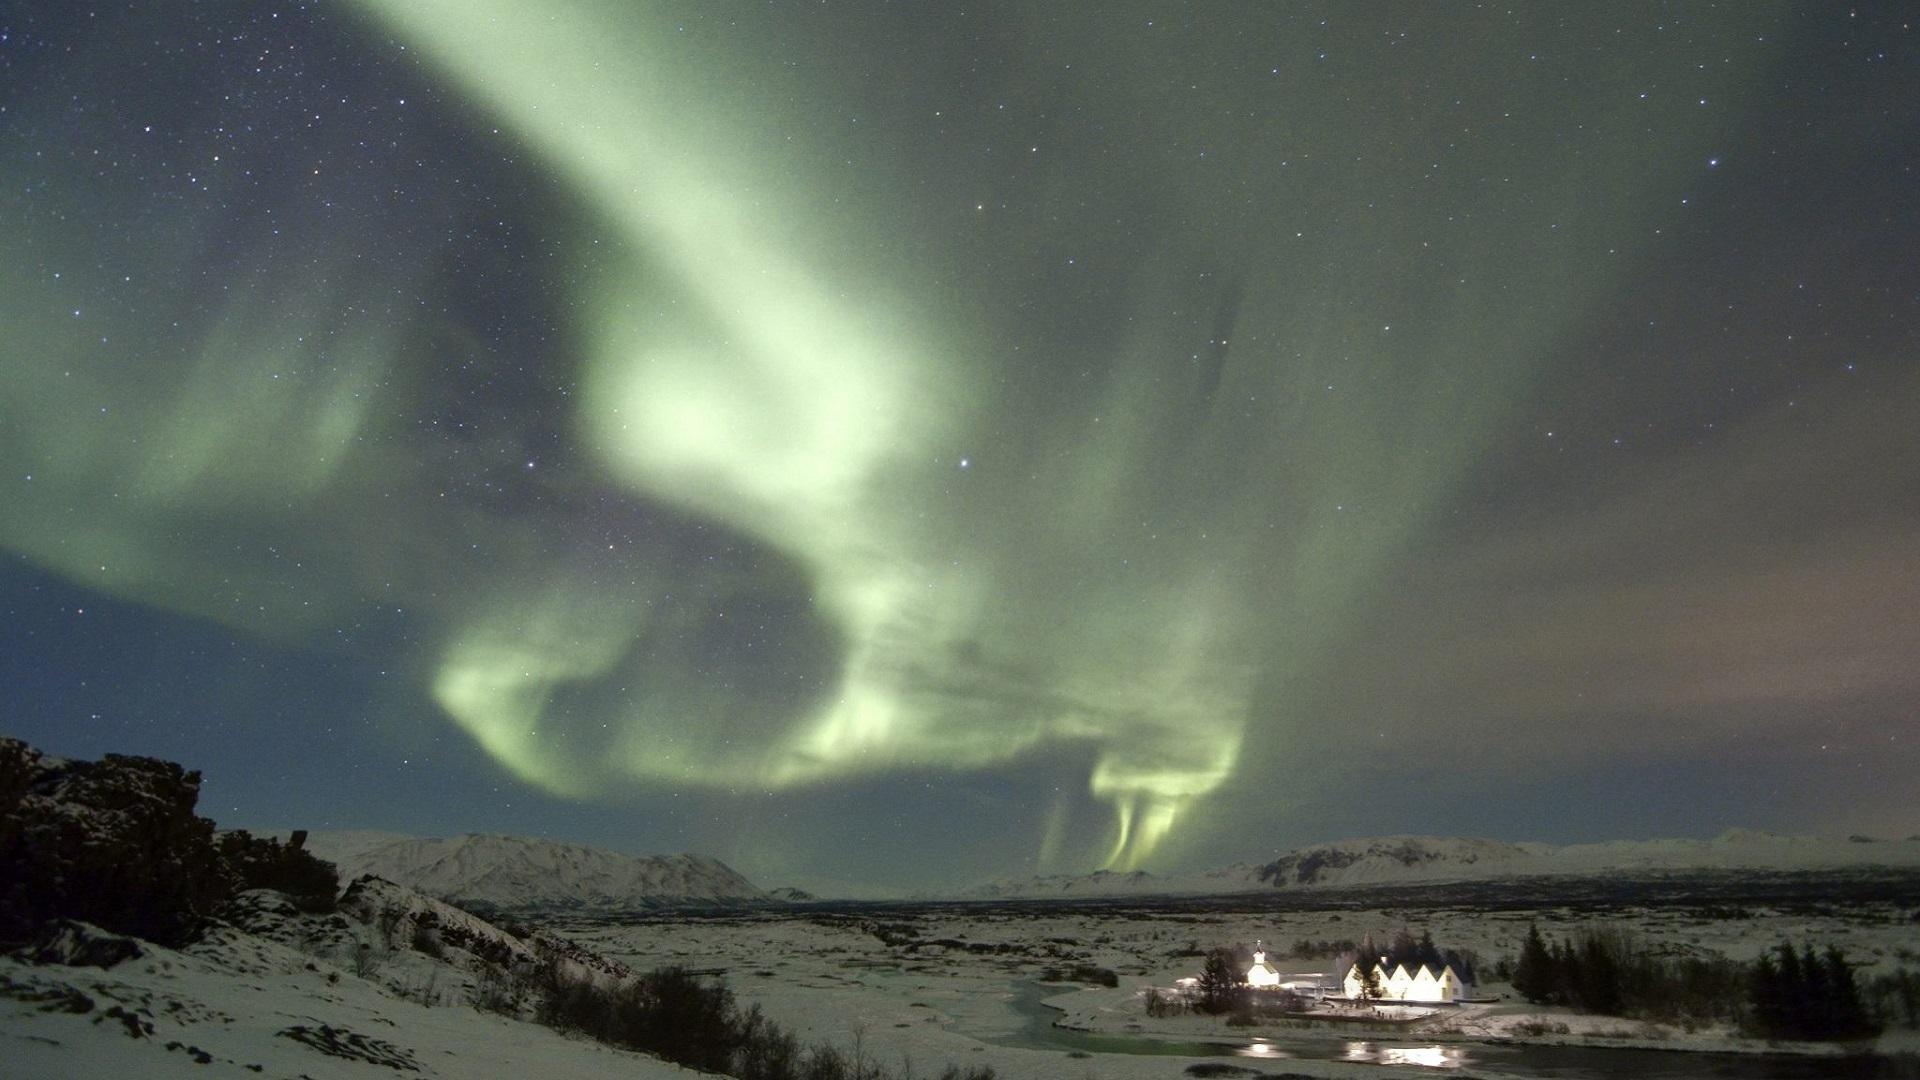 Aurora borealis over snowy village at night